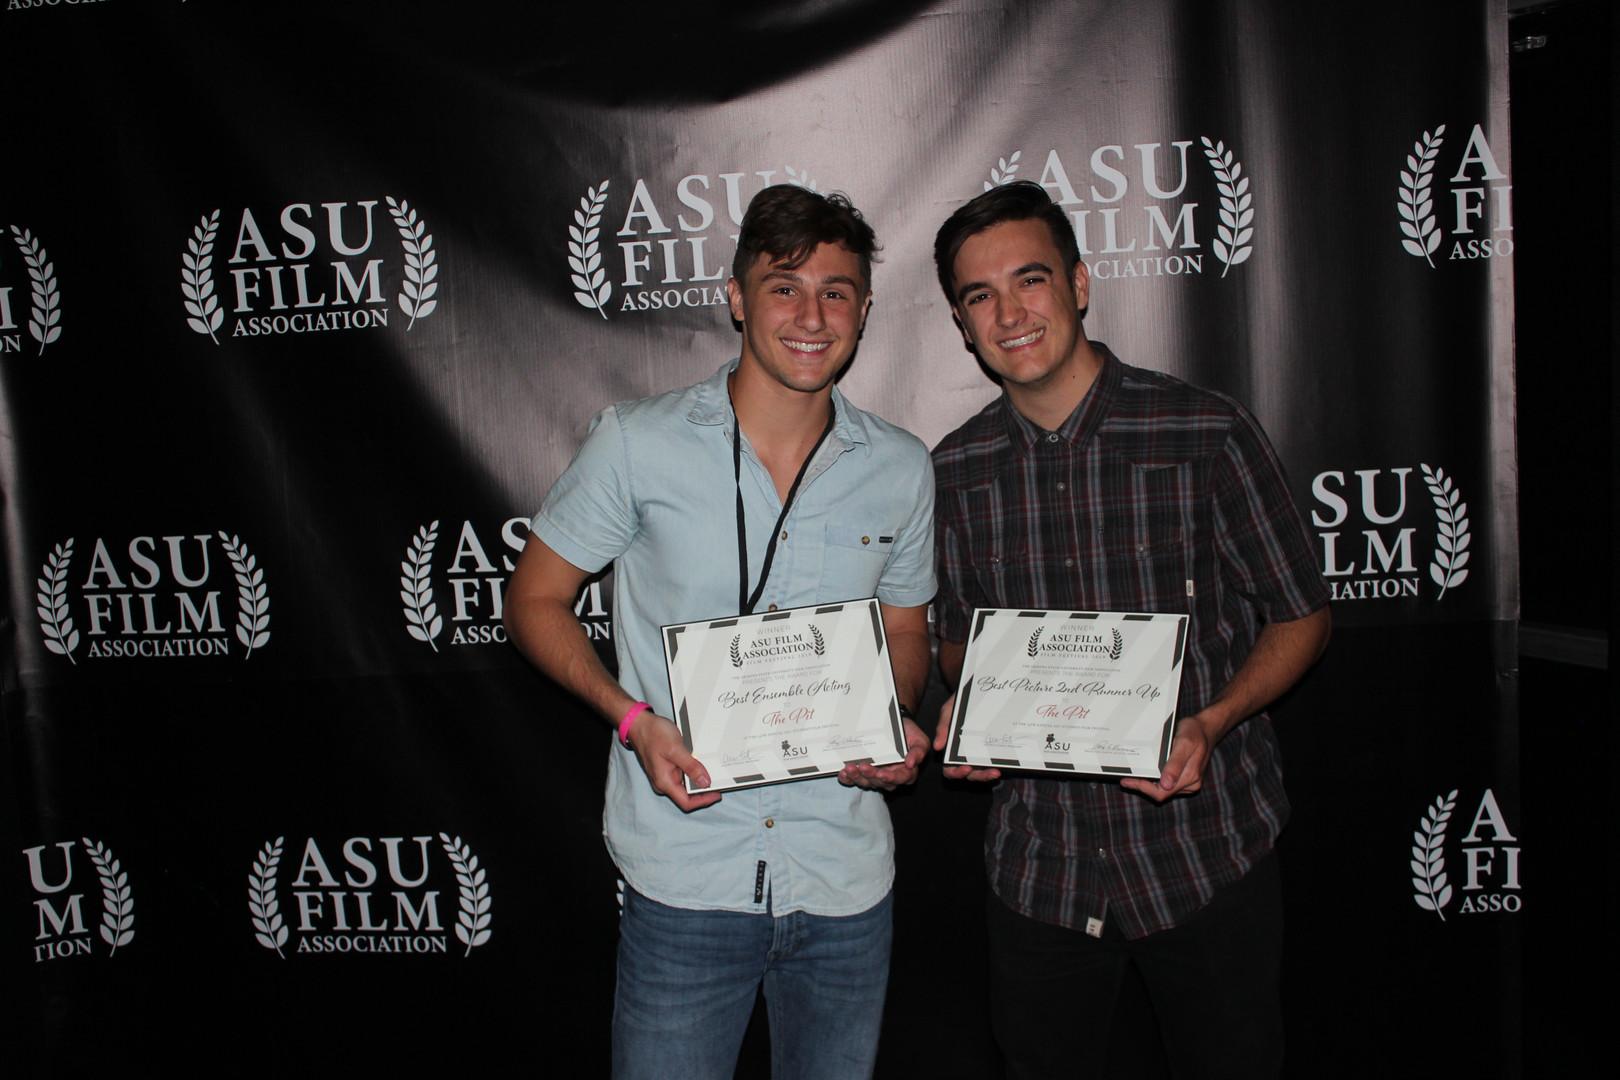 Brandon Sonju and Joey DeBlanco at the ASU Film Festival